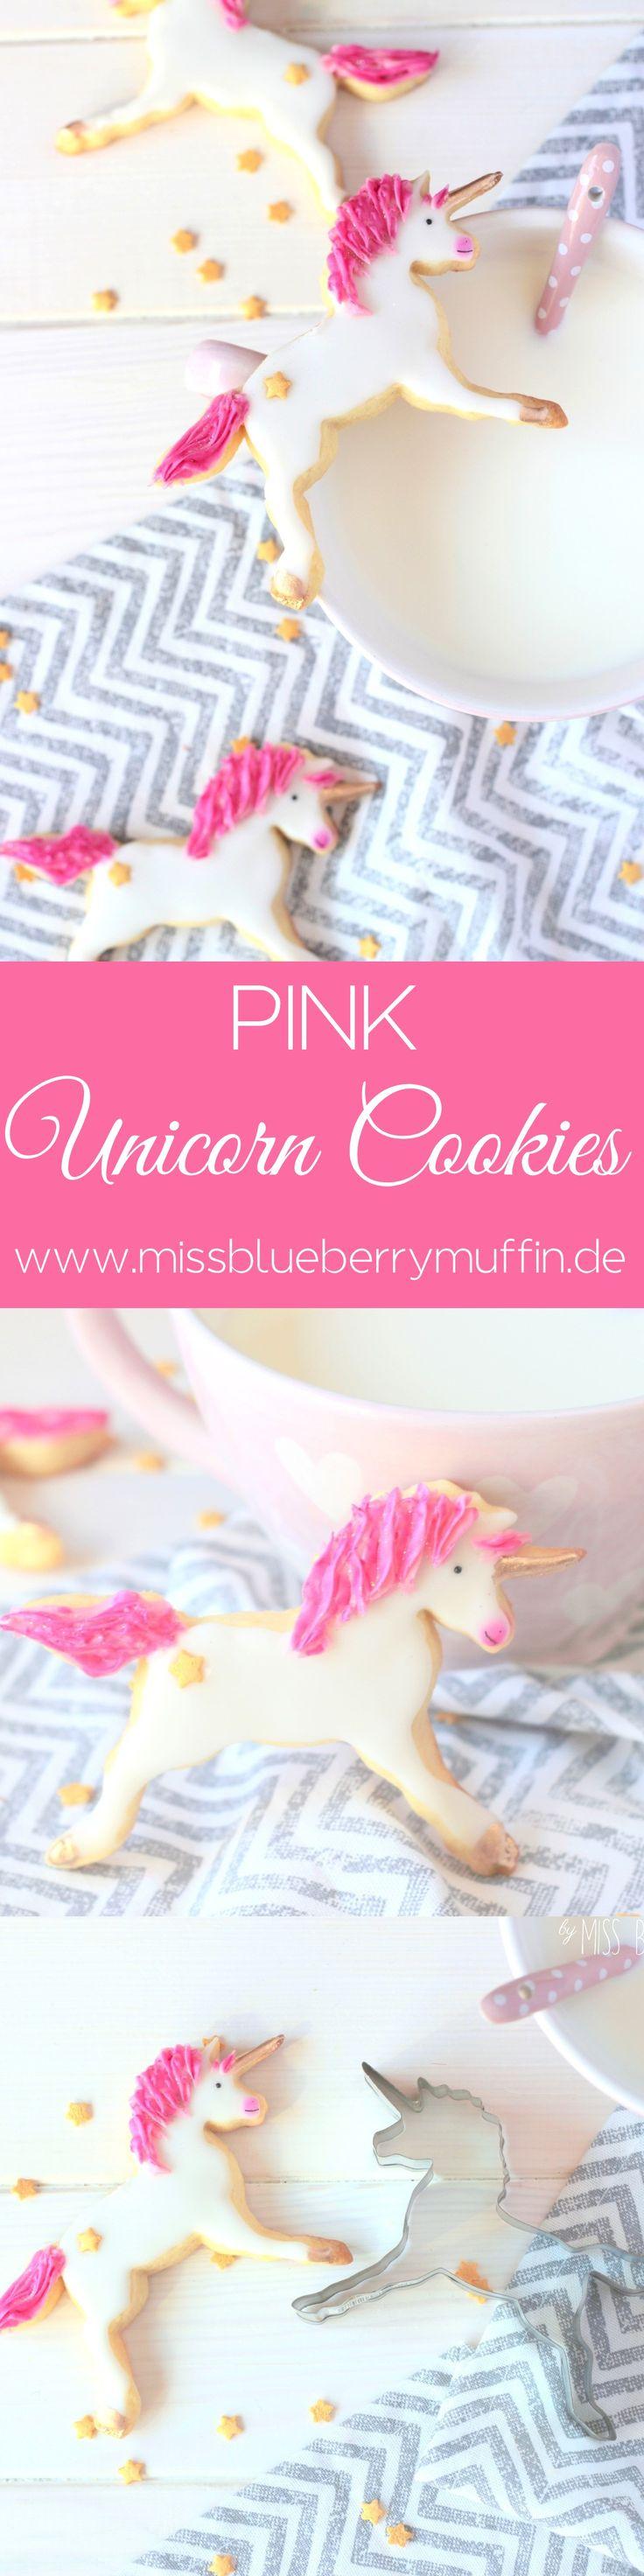 Gibt es etwas süßeres als pinke Einhorn Cookies? <3 // Pink Unicorn Cookies